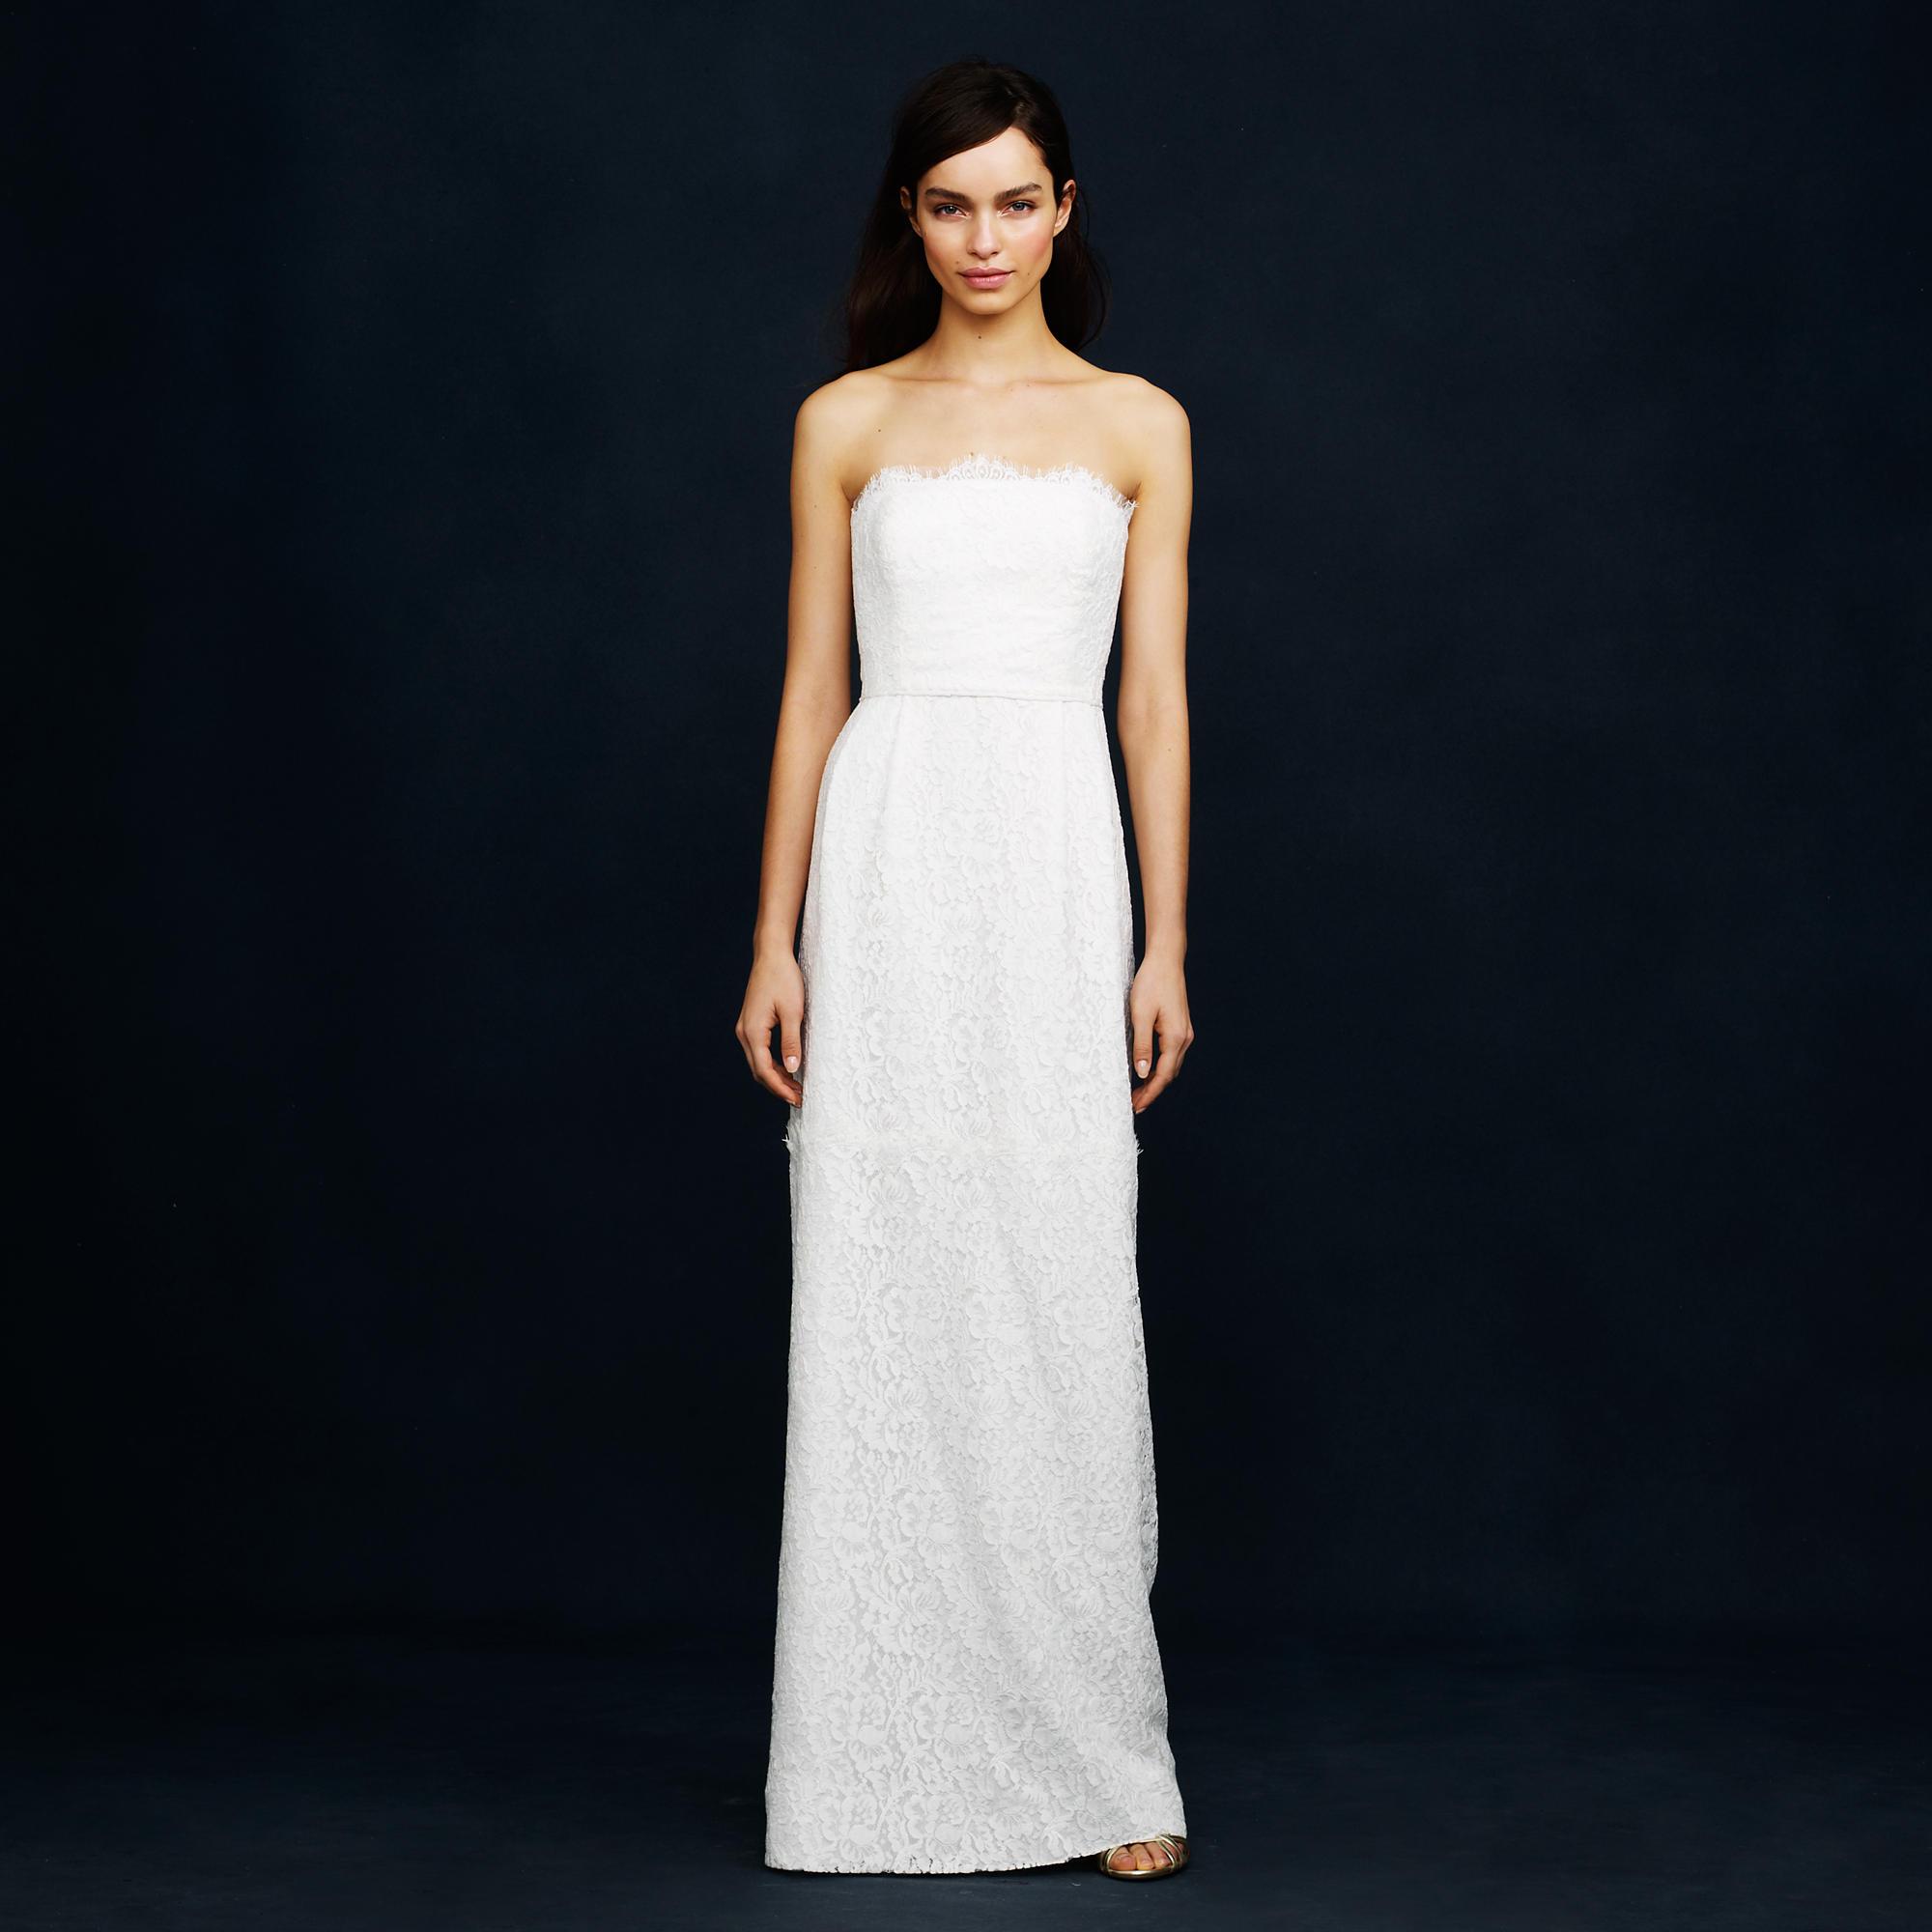 J Crew Simple Wedding Dresses: Eyelash Lace Gown :